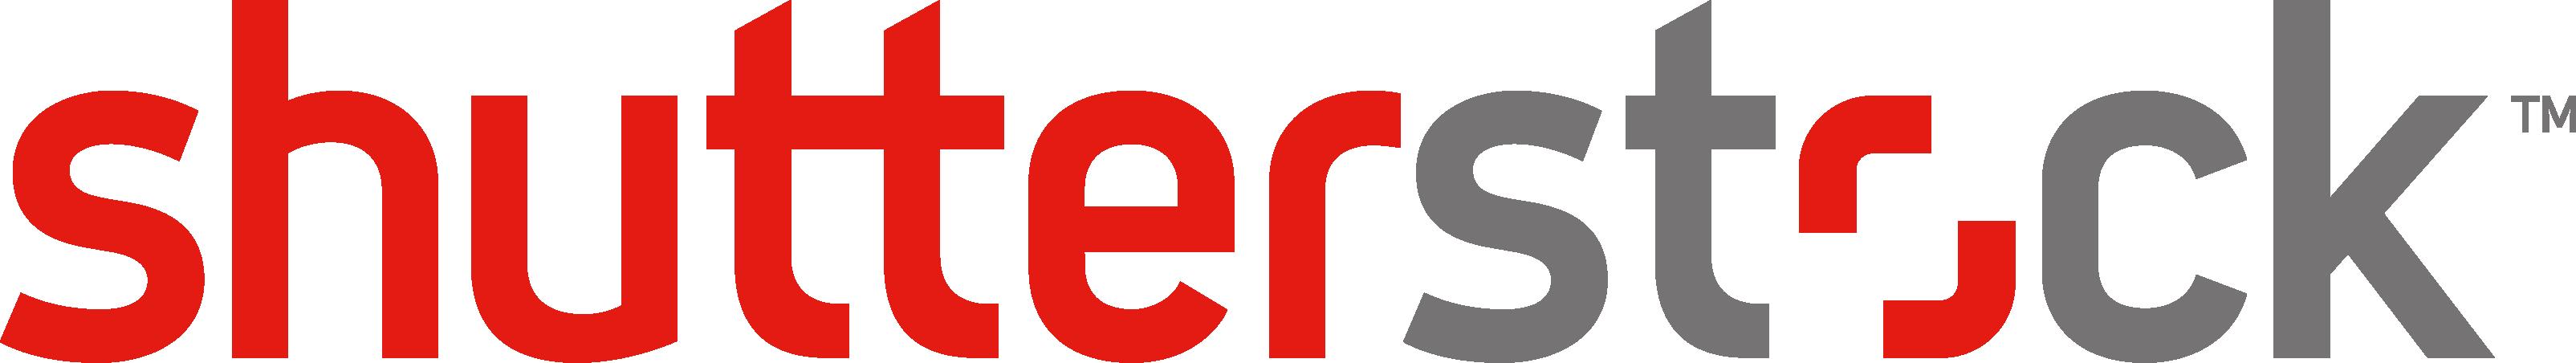 shutterstock-logo